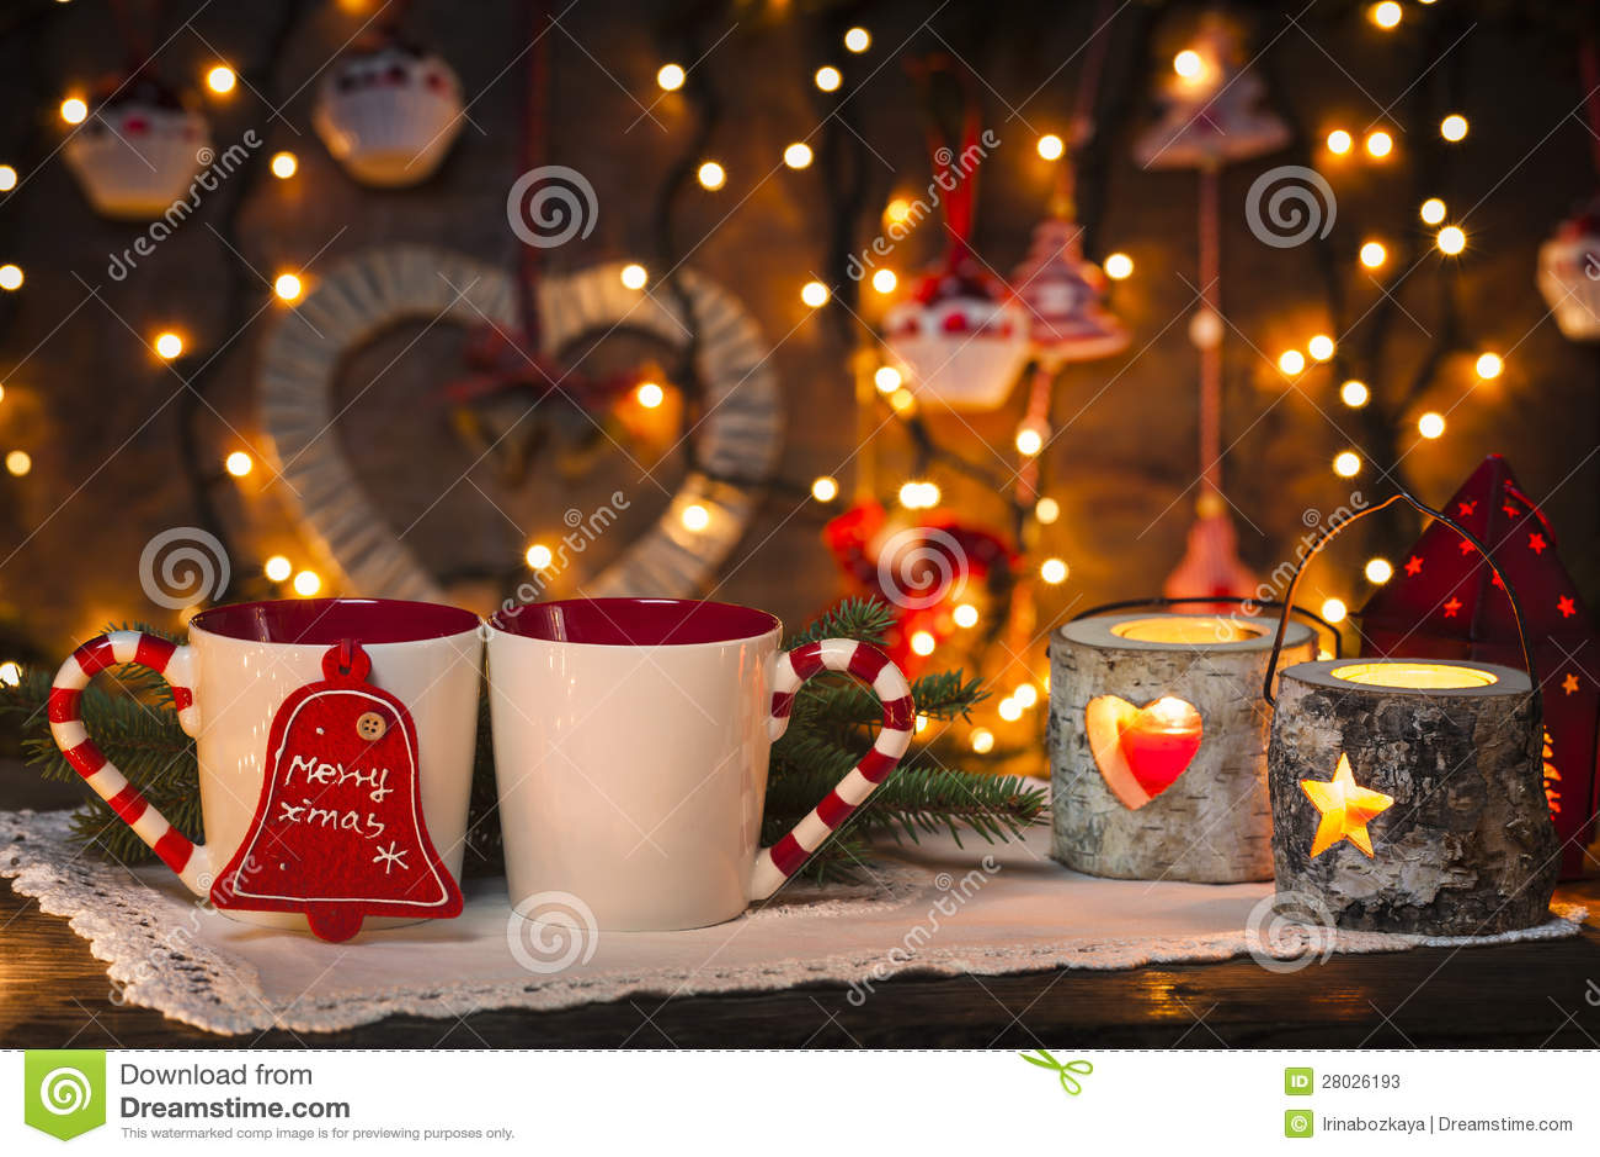 Rustic Fall Desktop Wallpaper Cozy Christmas Stock Image Image Of Both Lights White